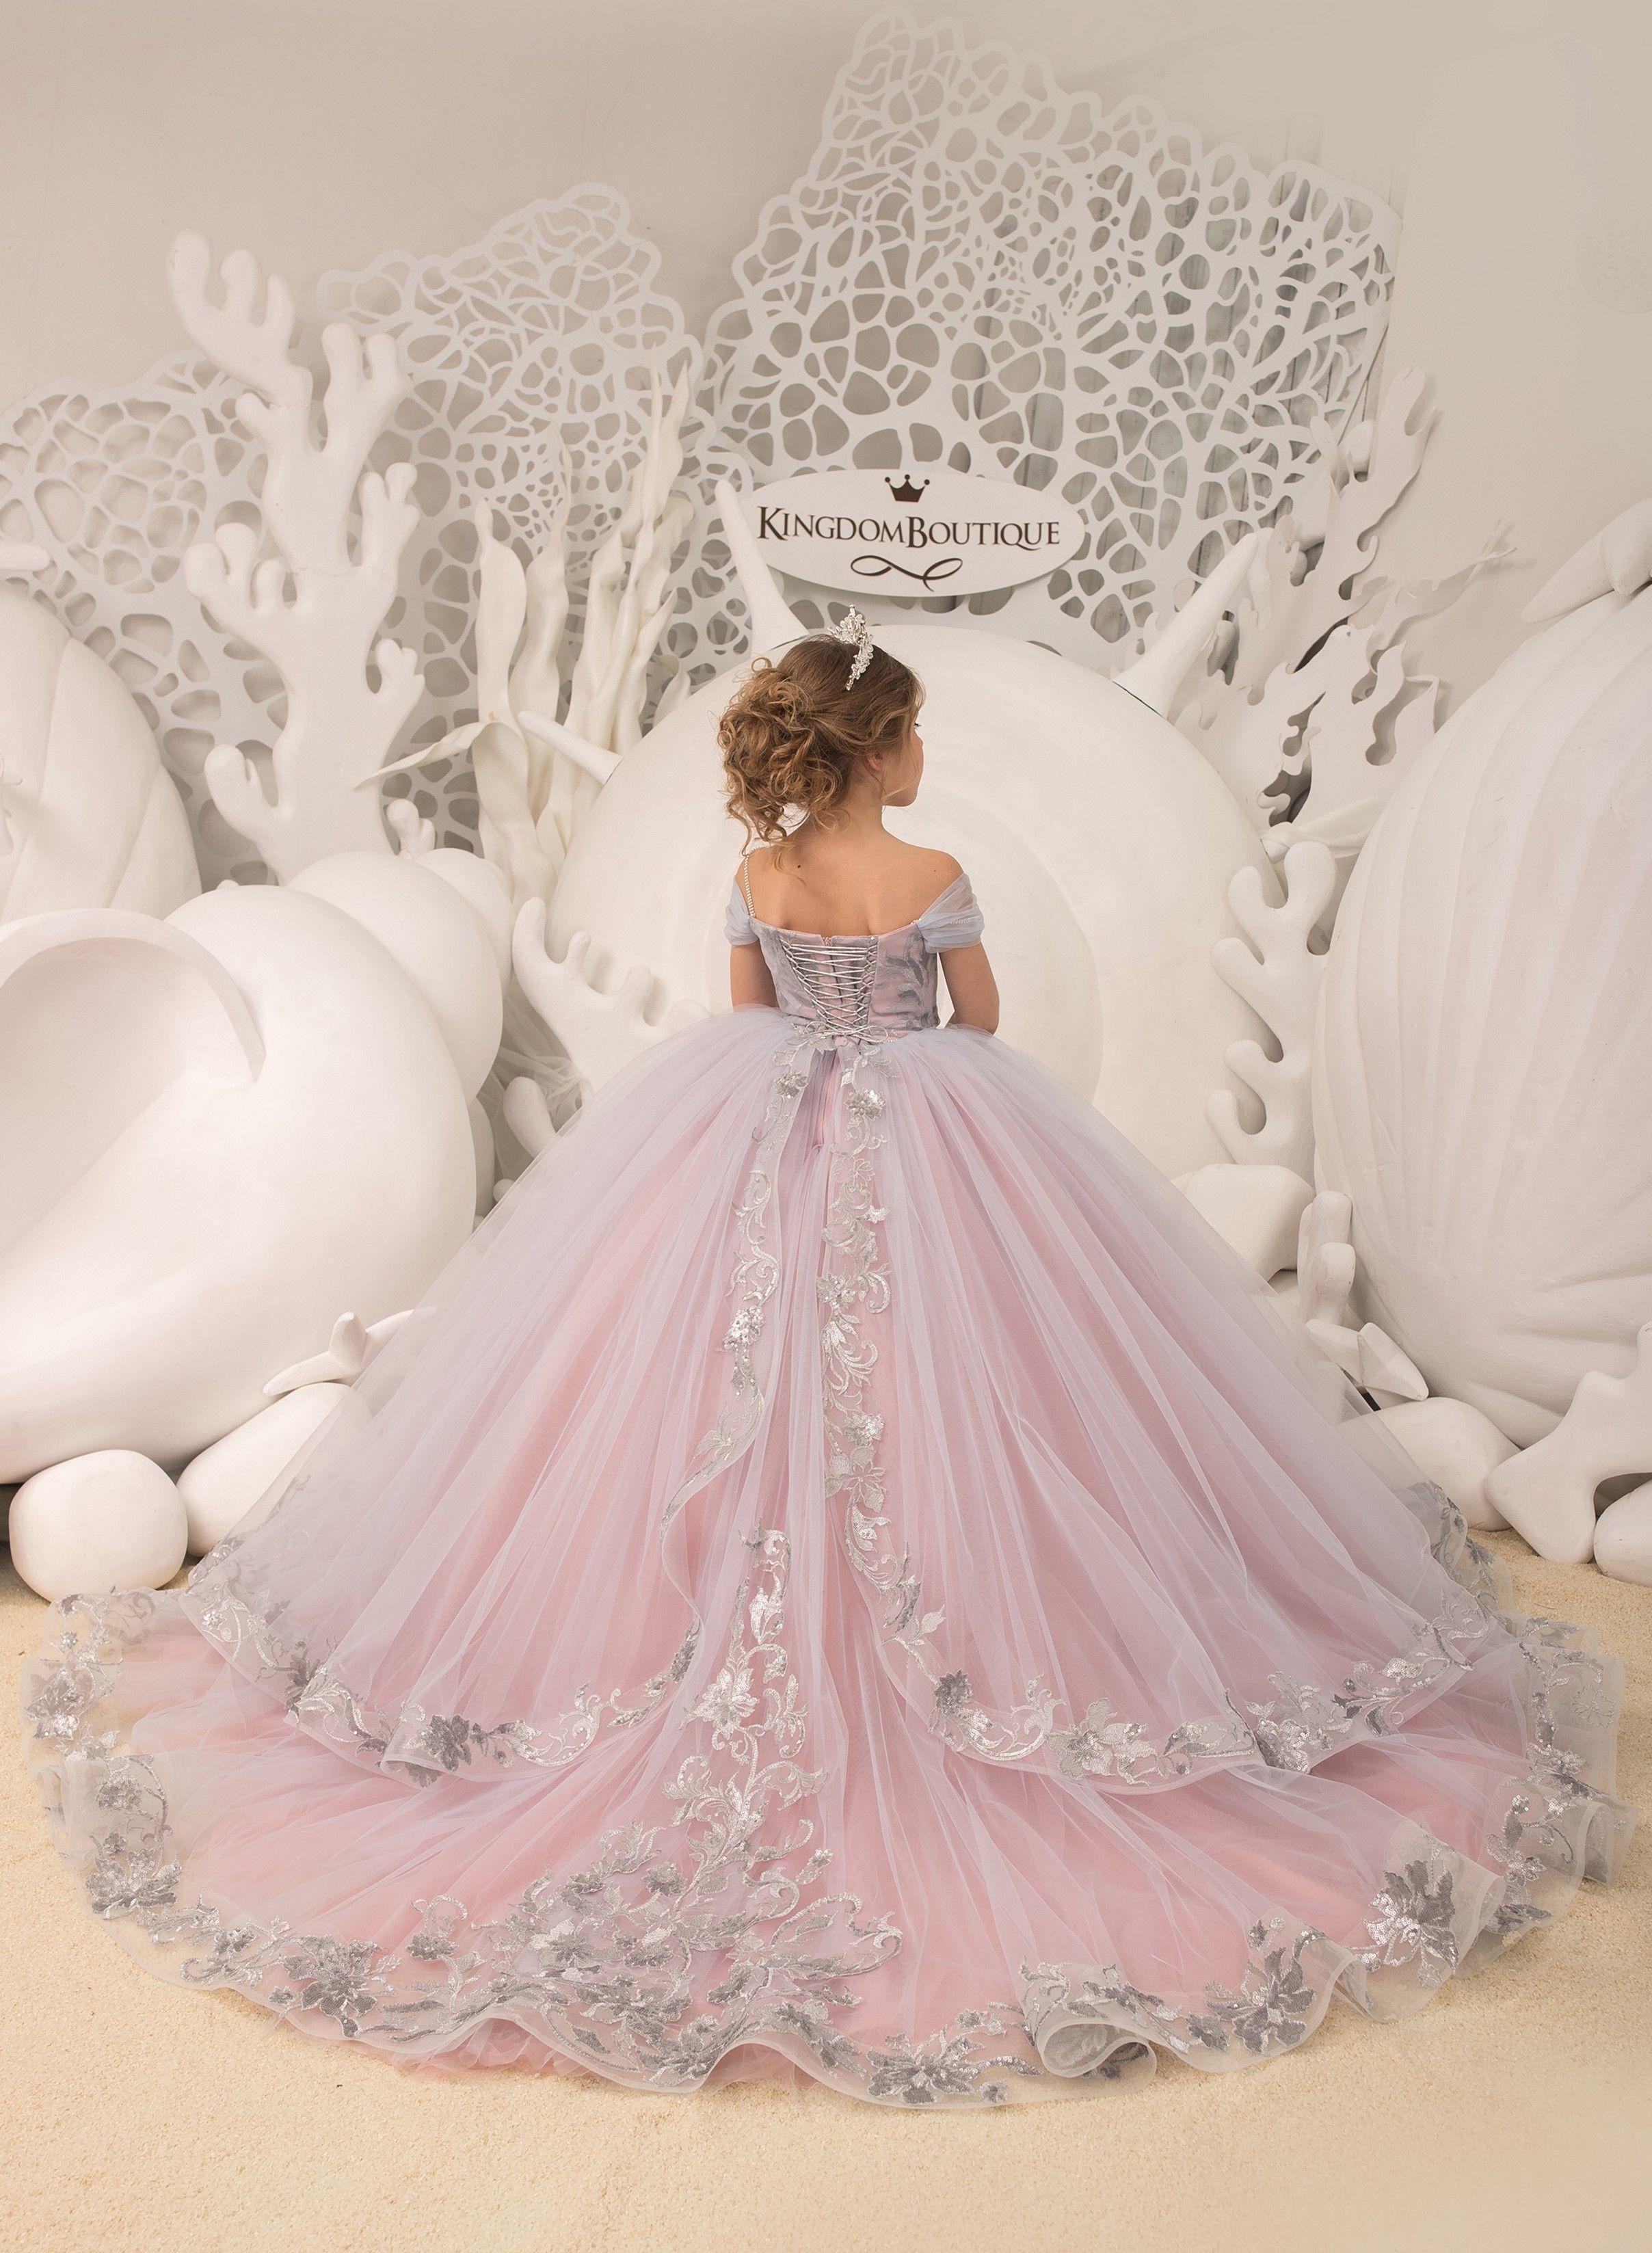 Girls Pearl Bracelet Birthday Party Bag Favor Princess Kids Wedding Flower Girl